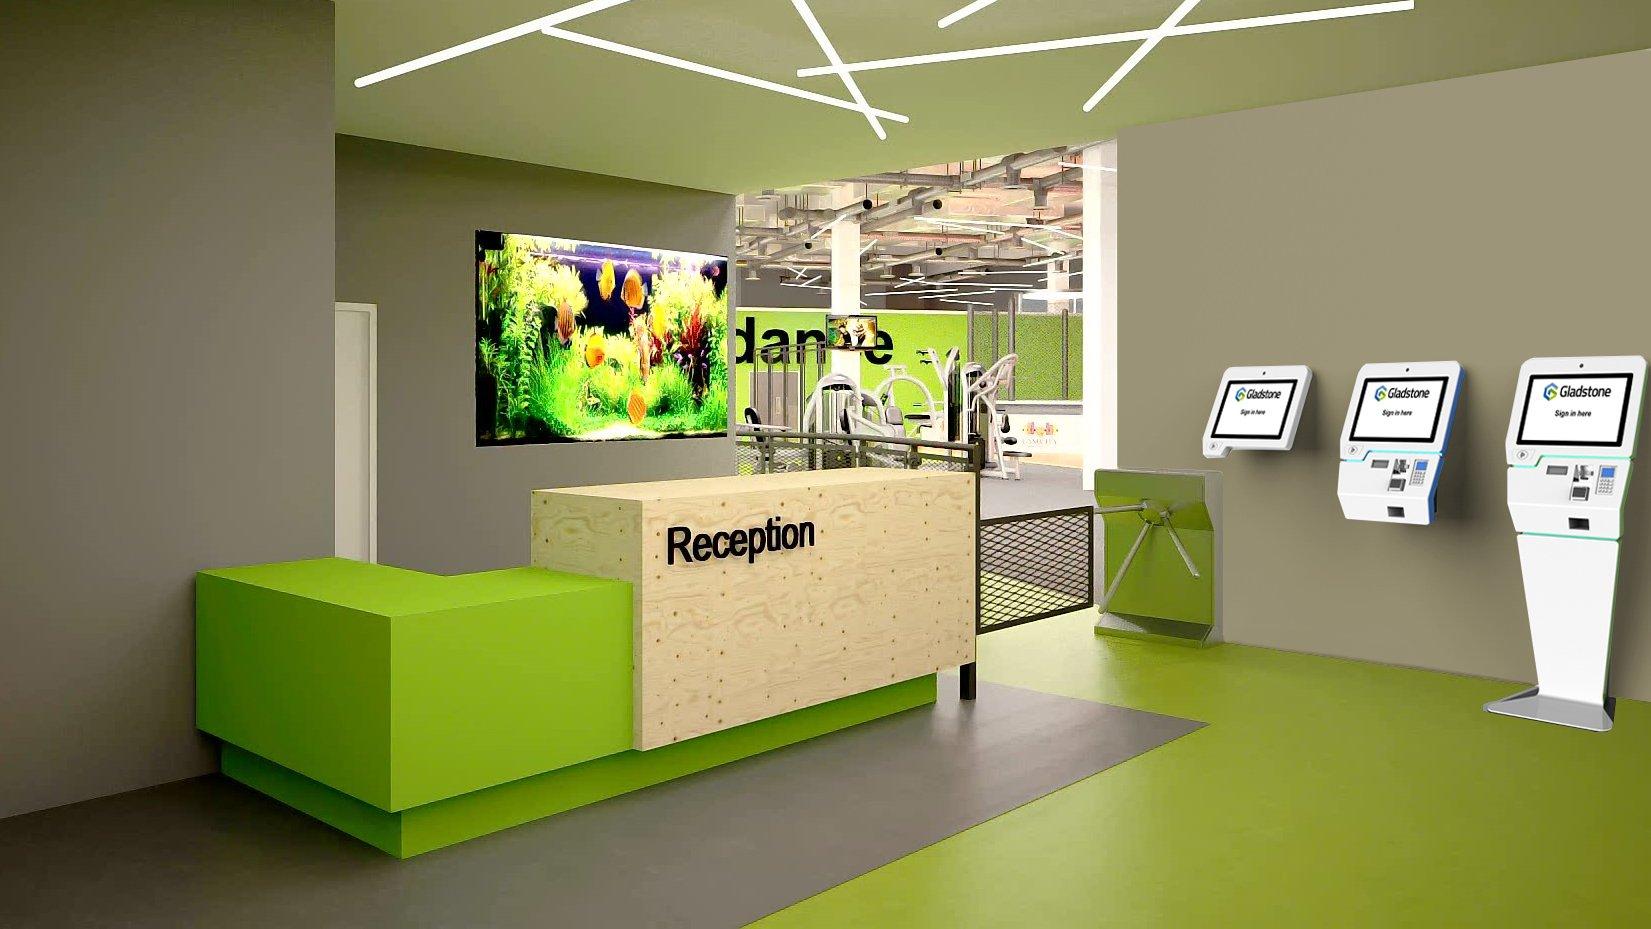 Kiosk v2 - reception render all 3